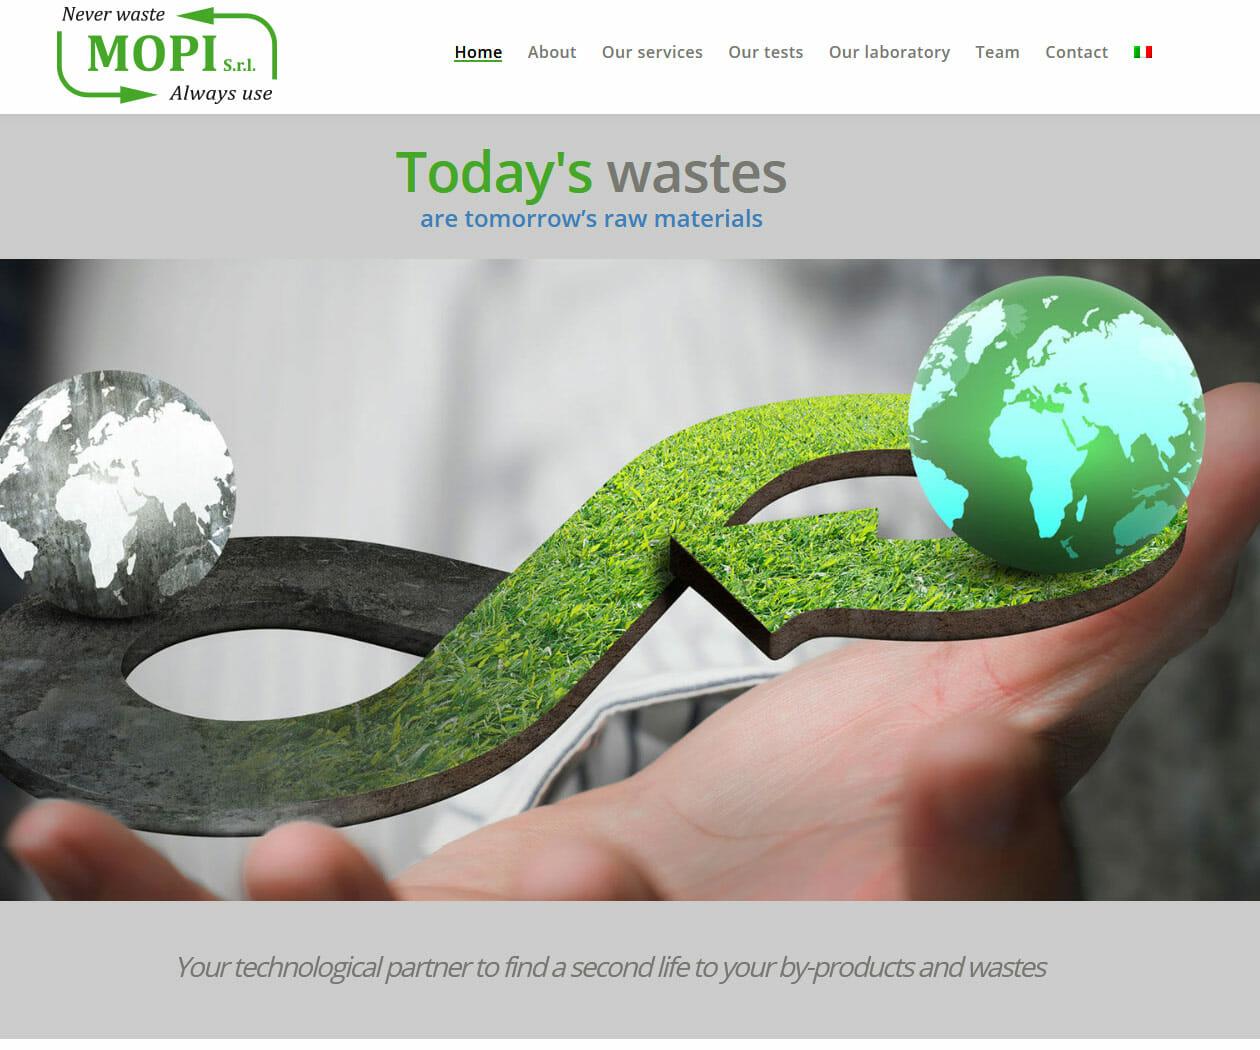 Sito Web Mopilab